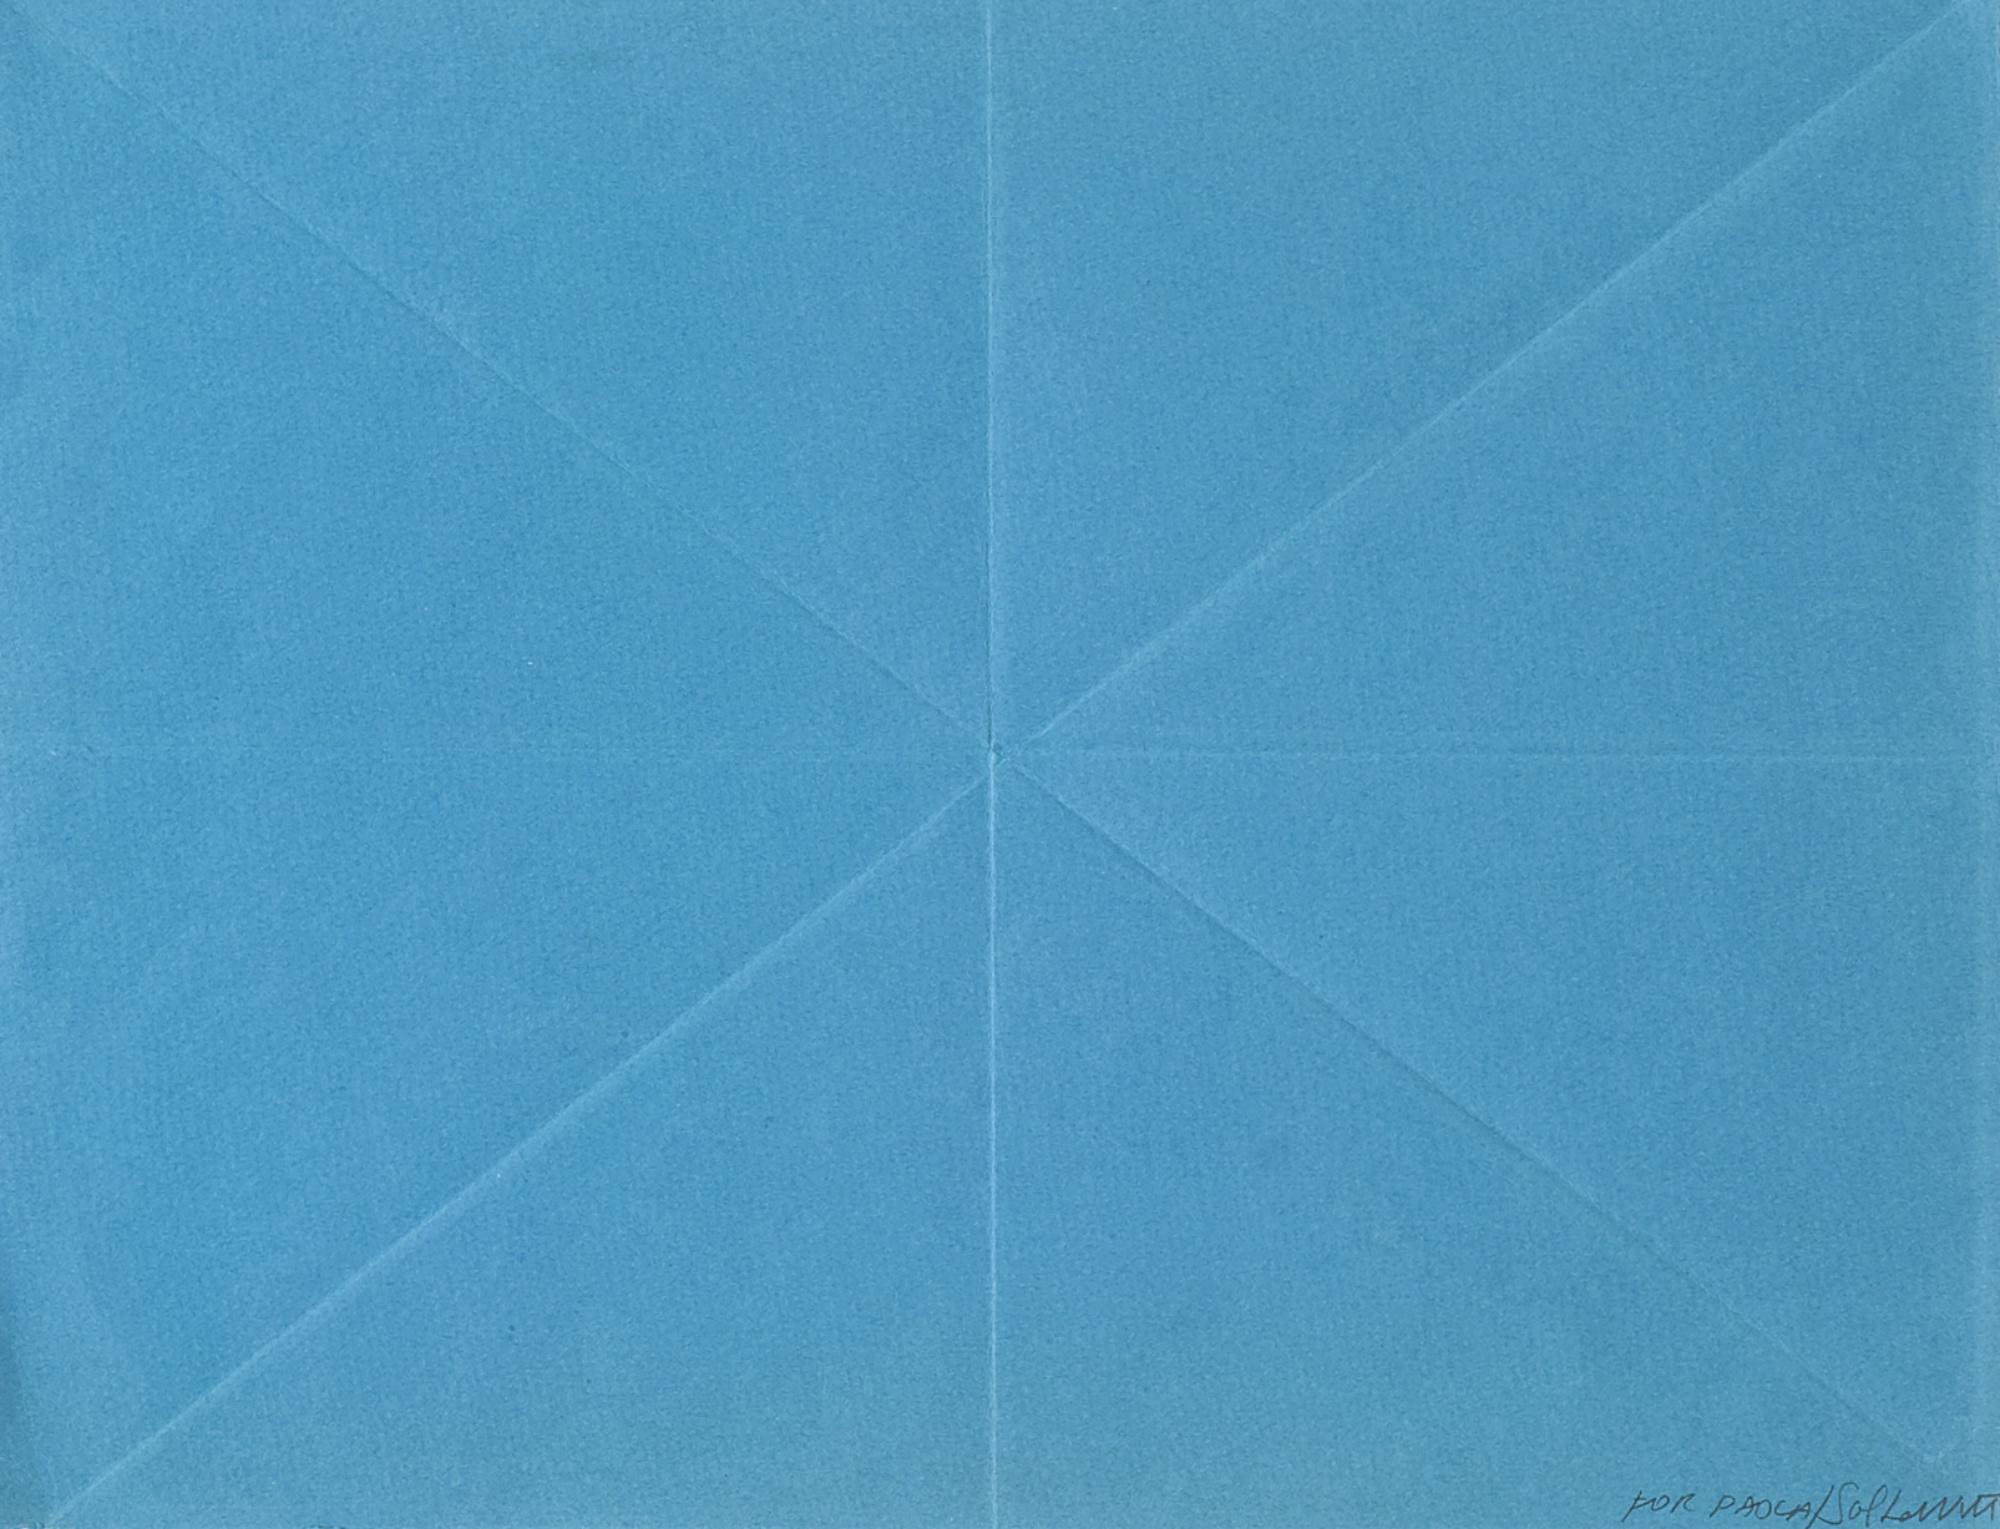 Sol LeWitt-Untitled-1971